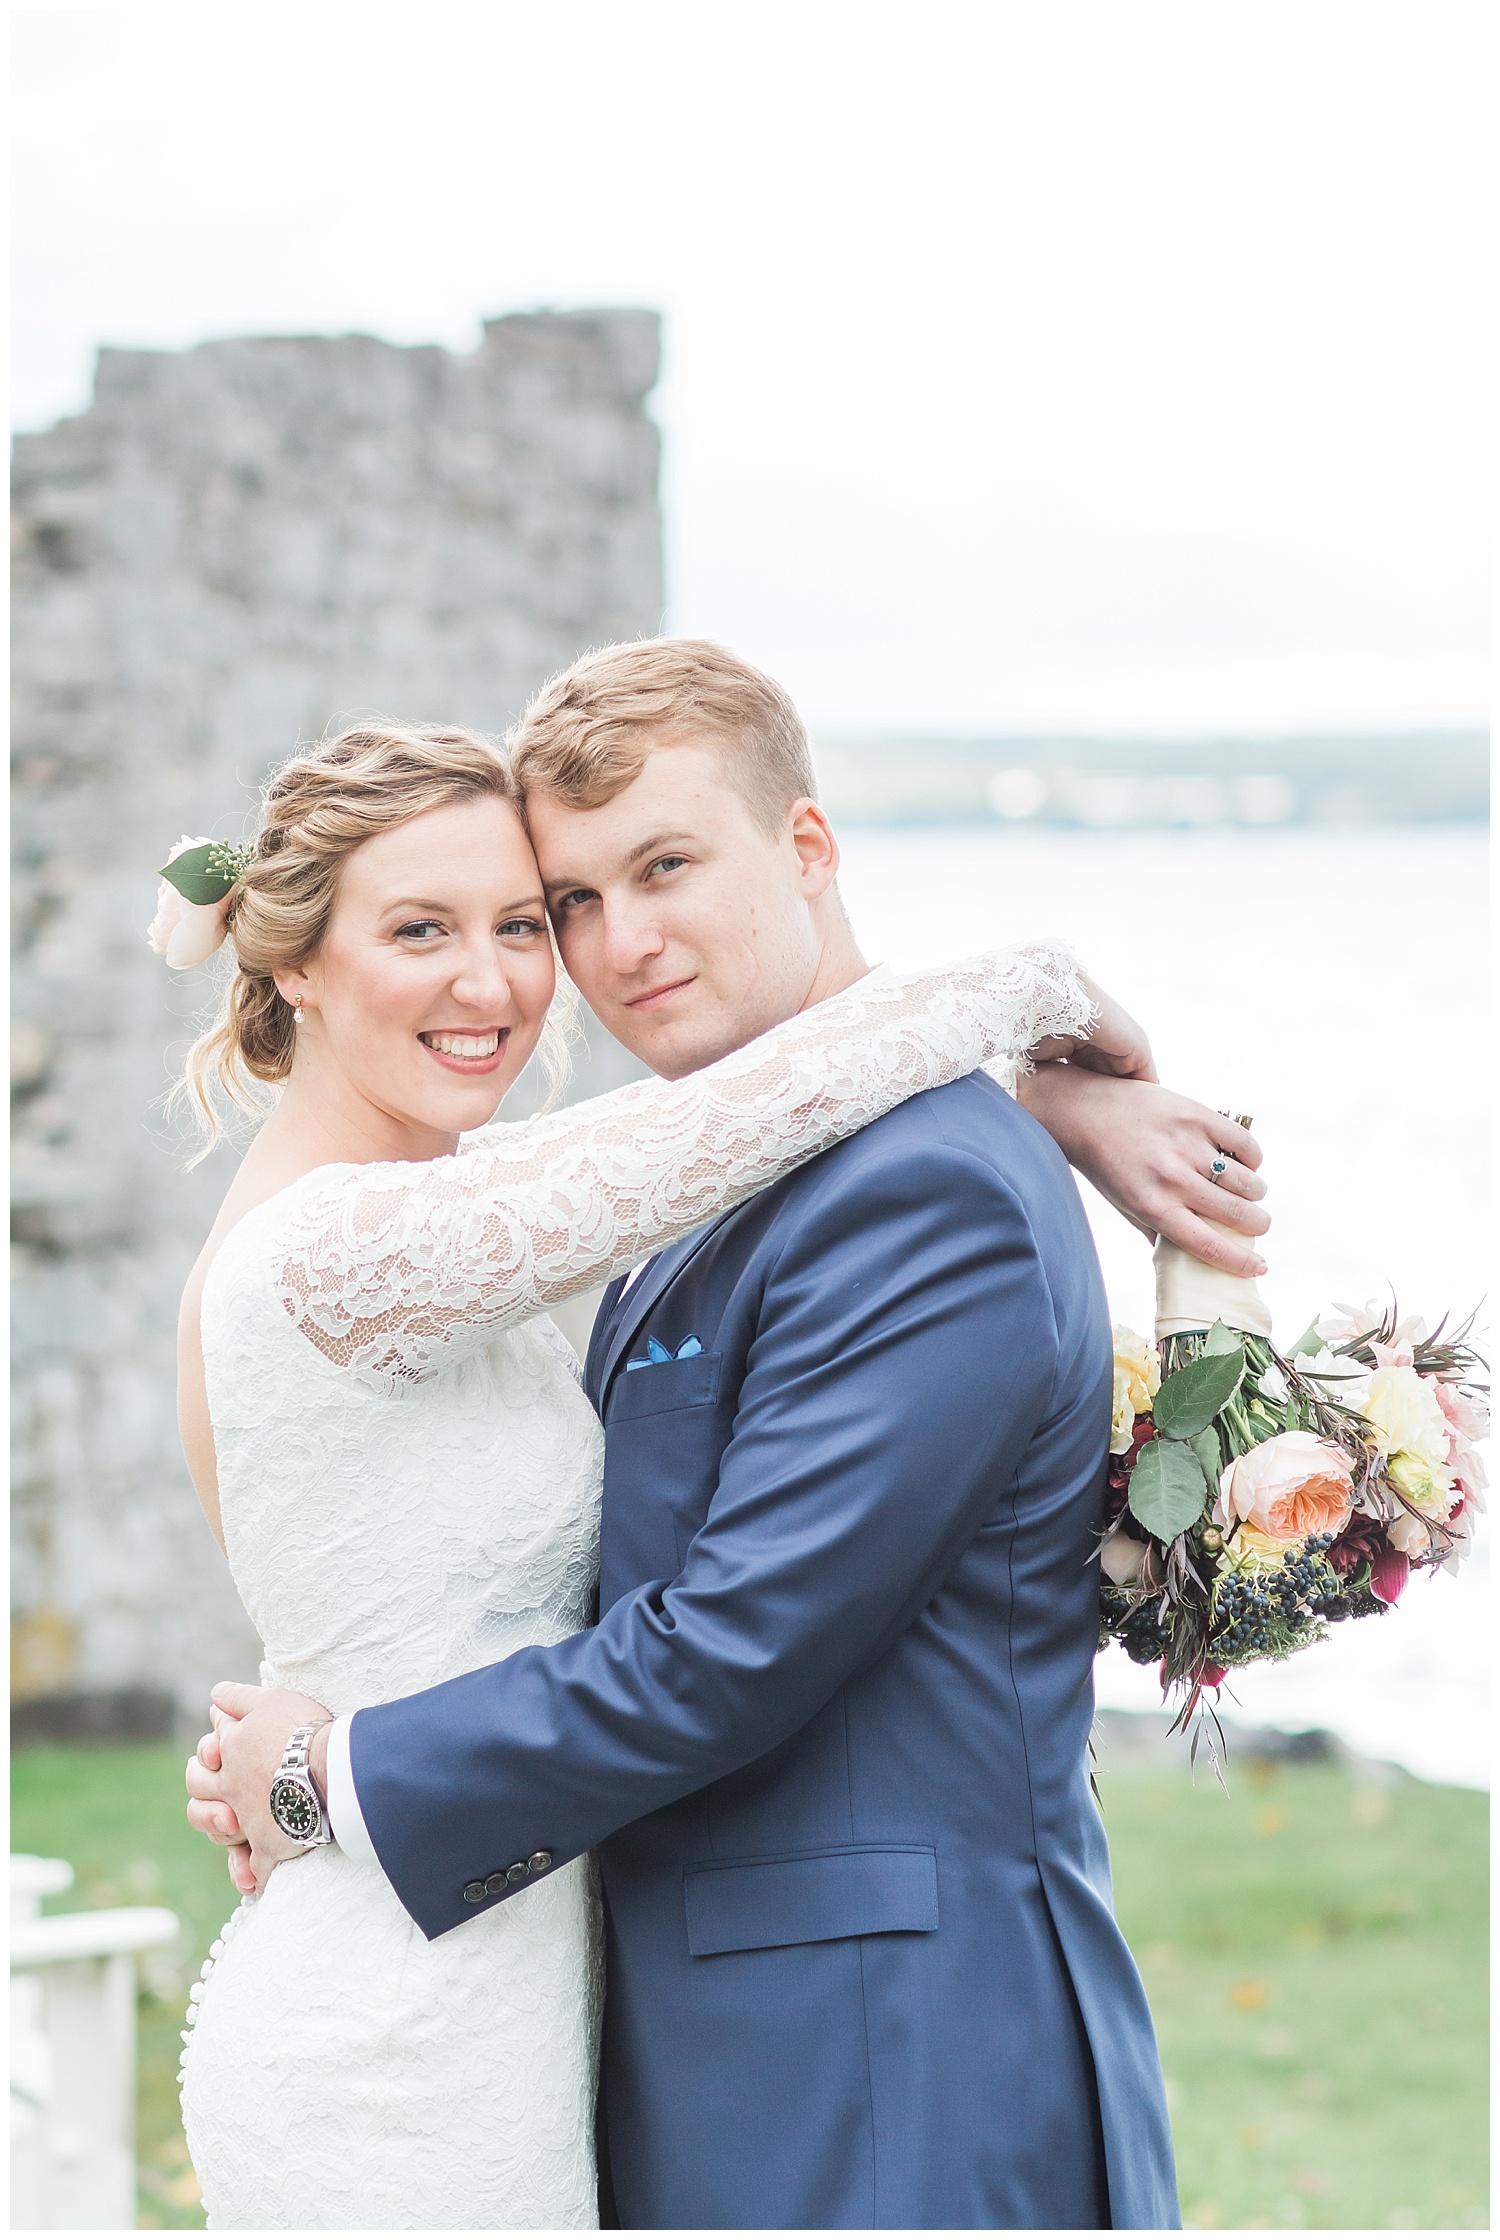 Margaret and Colin - Inns of Aurora - Lass and Beau-930_Buffalo wedding photography.jpg